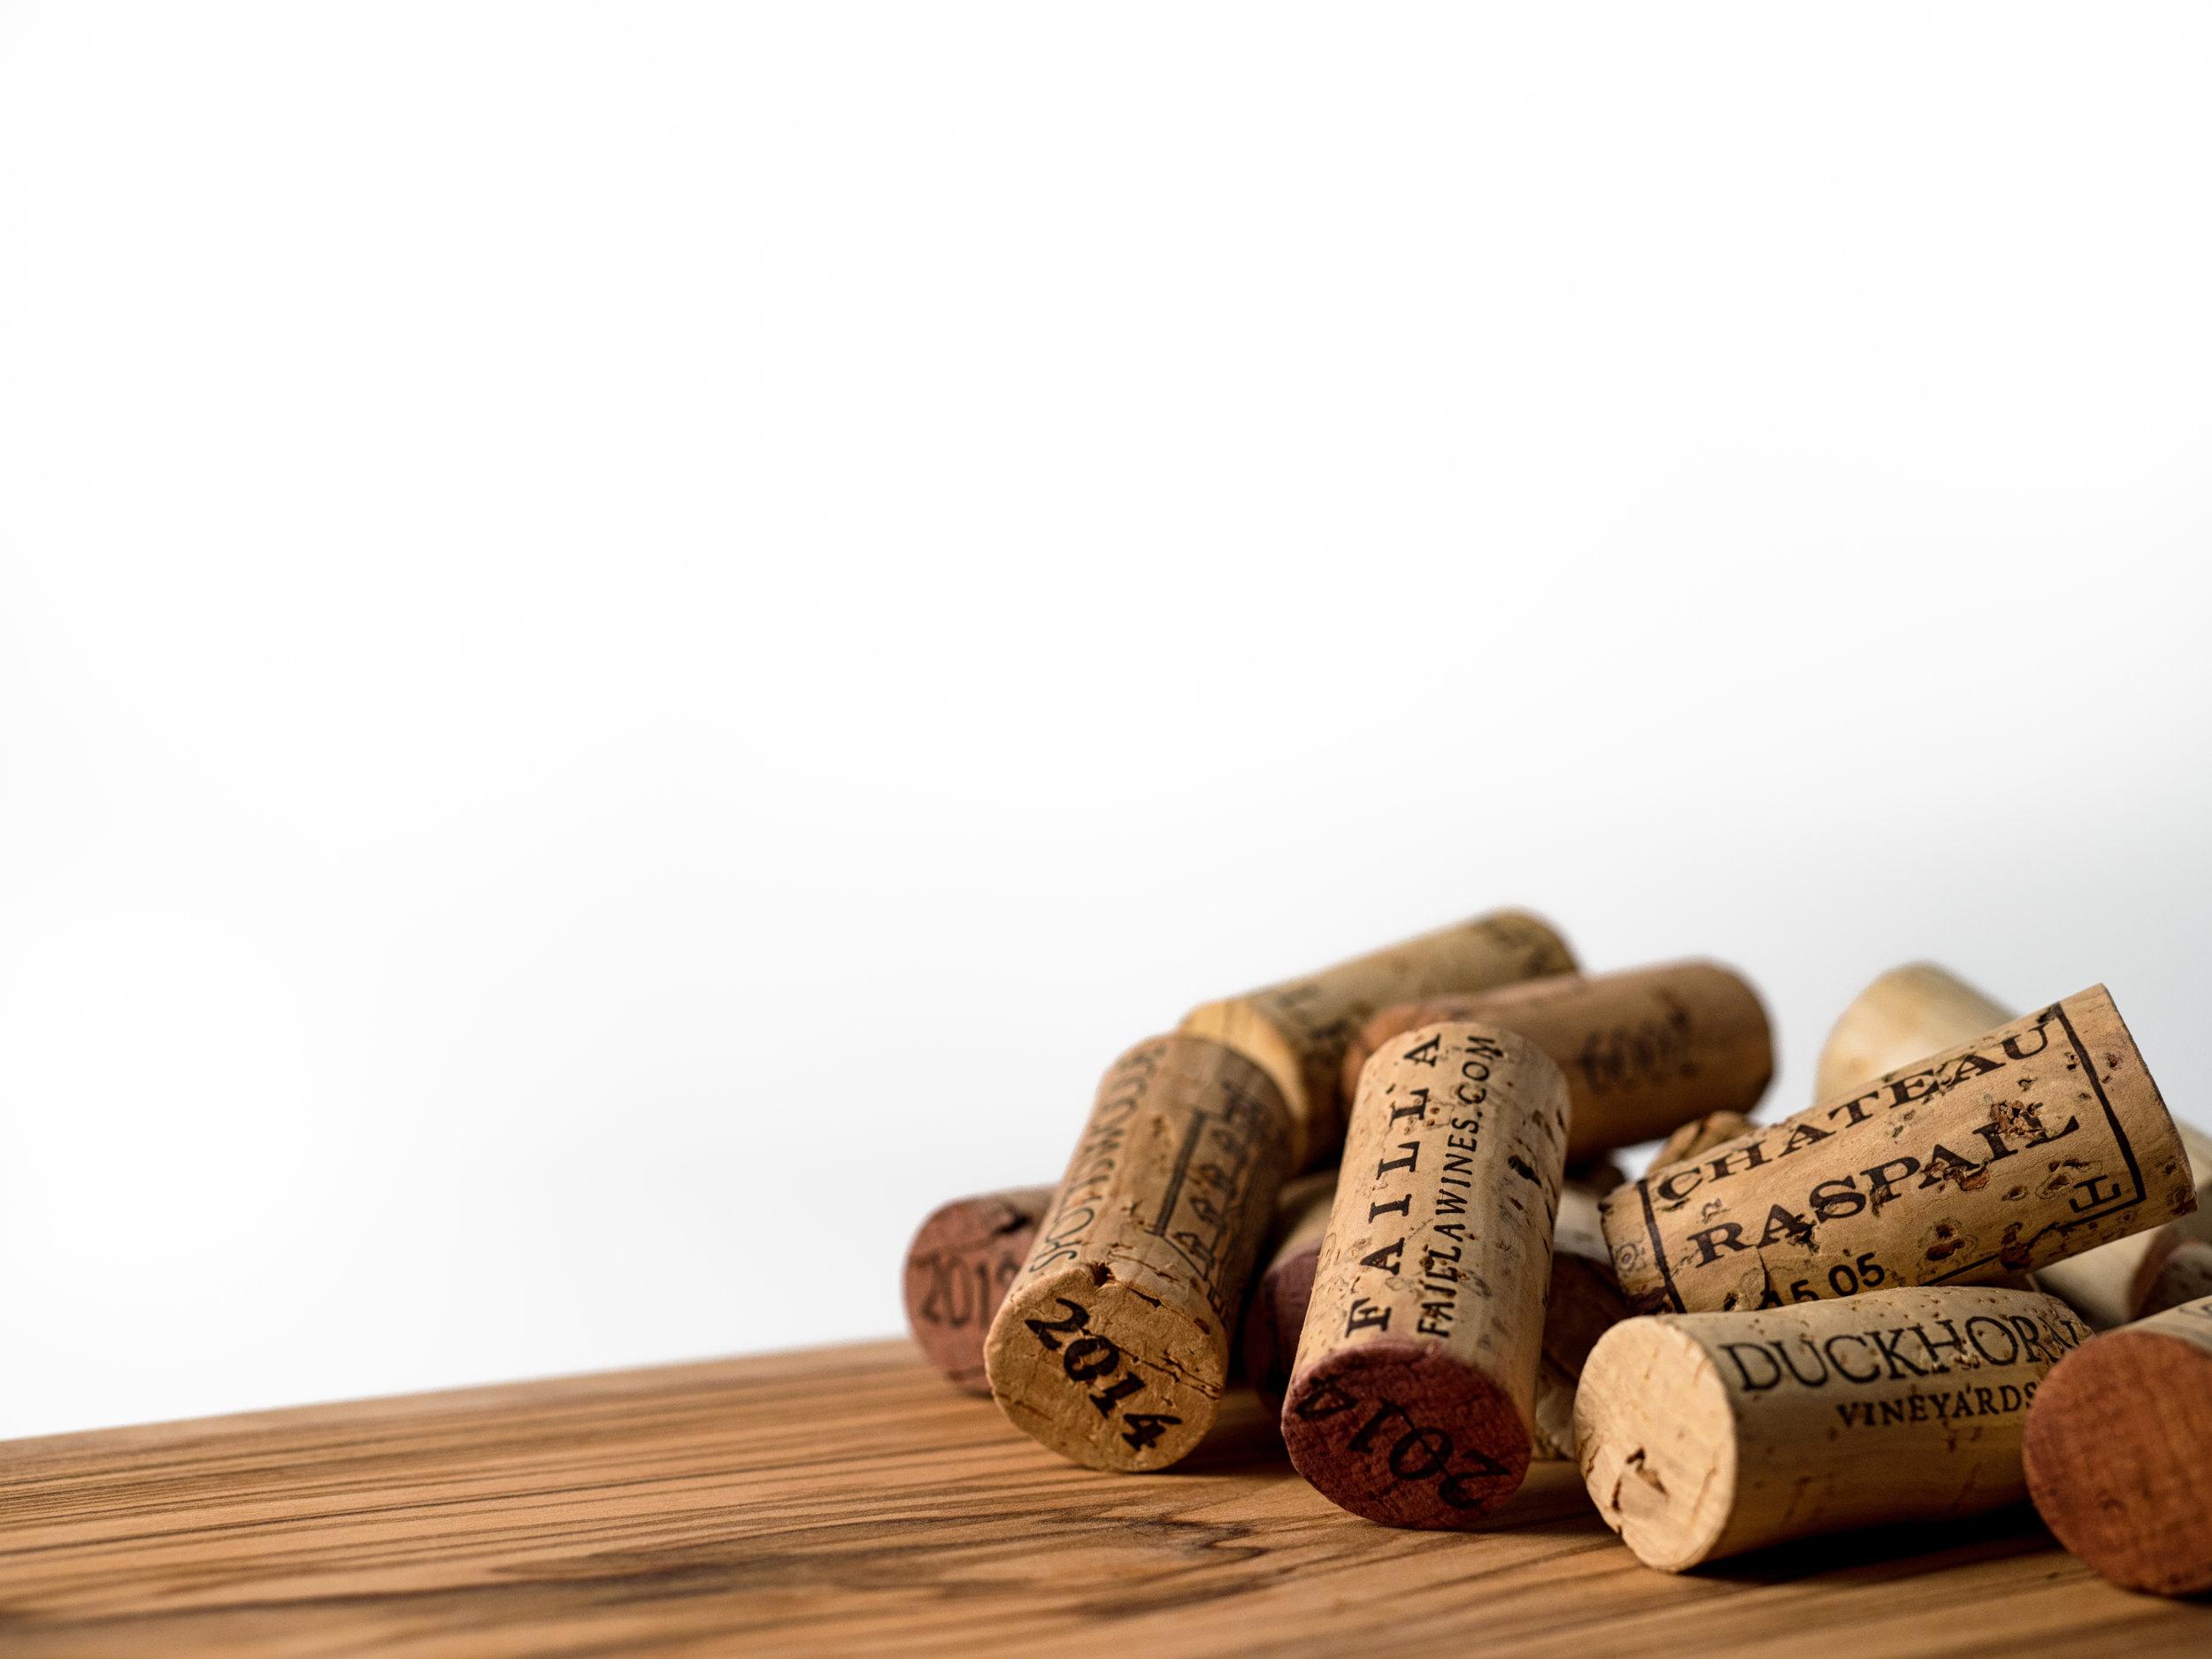 Musings by the Glass - Cork vs Screw Cap - Pile of Corks